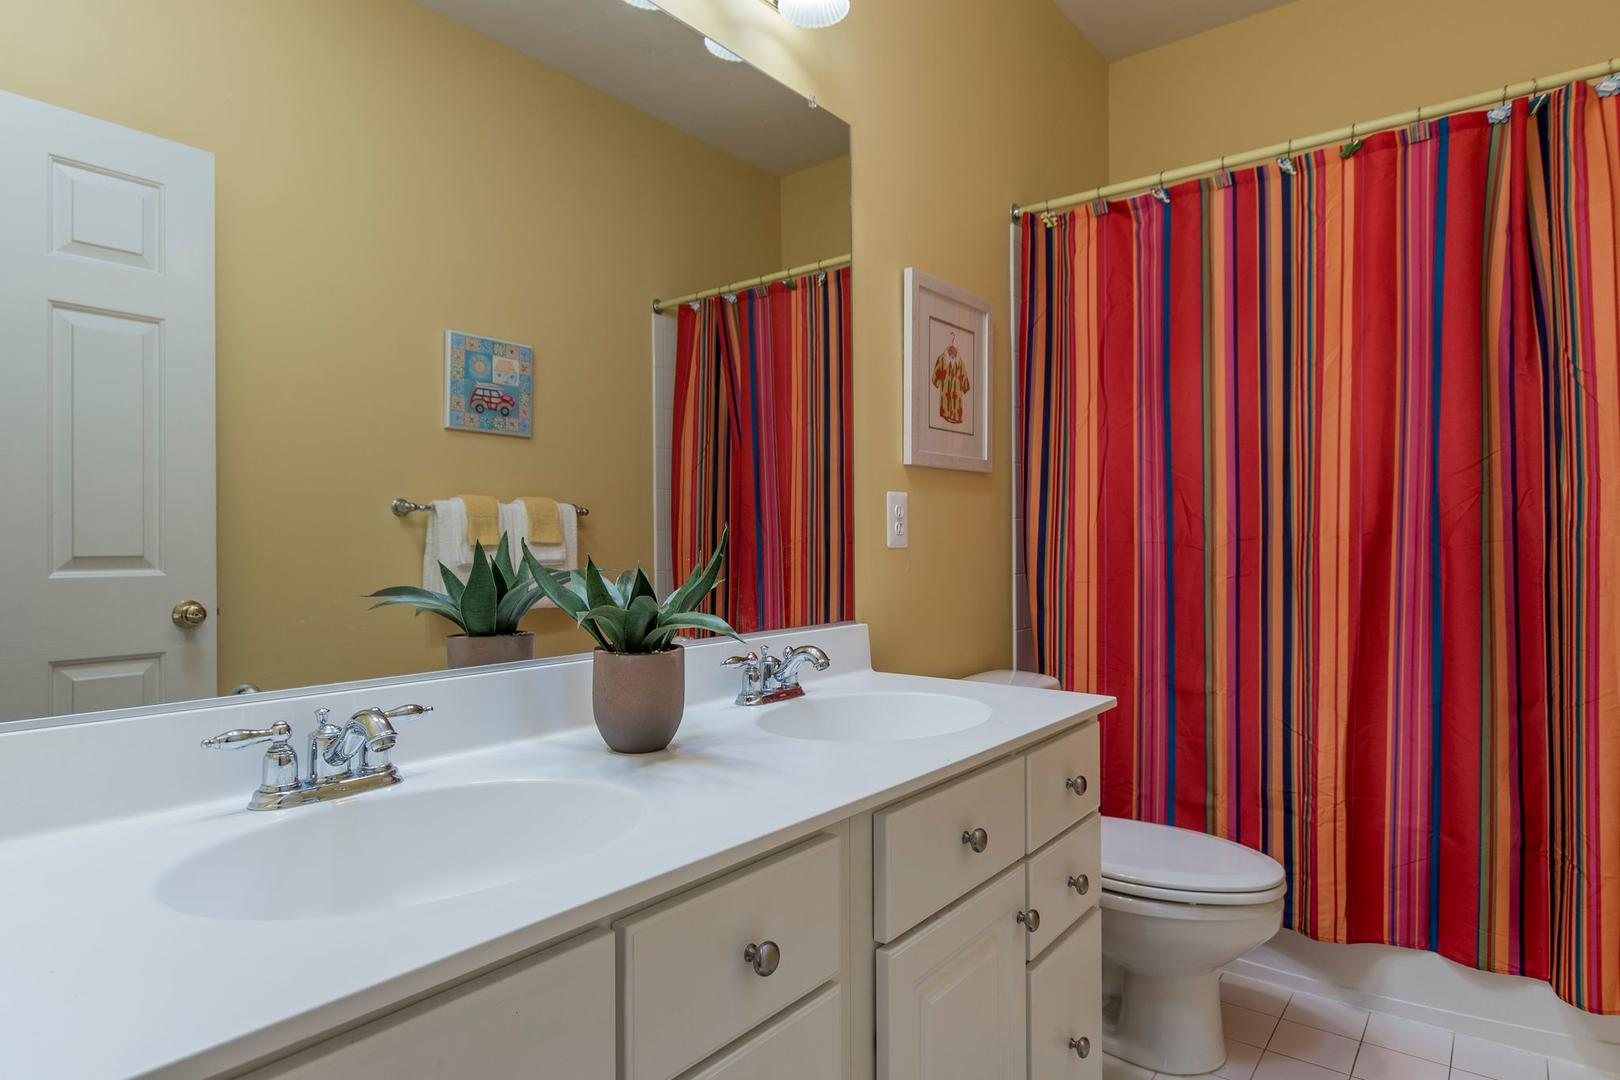 Sunset Island 12 Shore Point Dr. - Ground Floor Bathroom